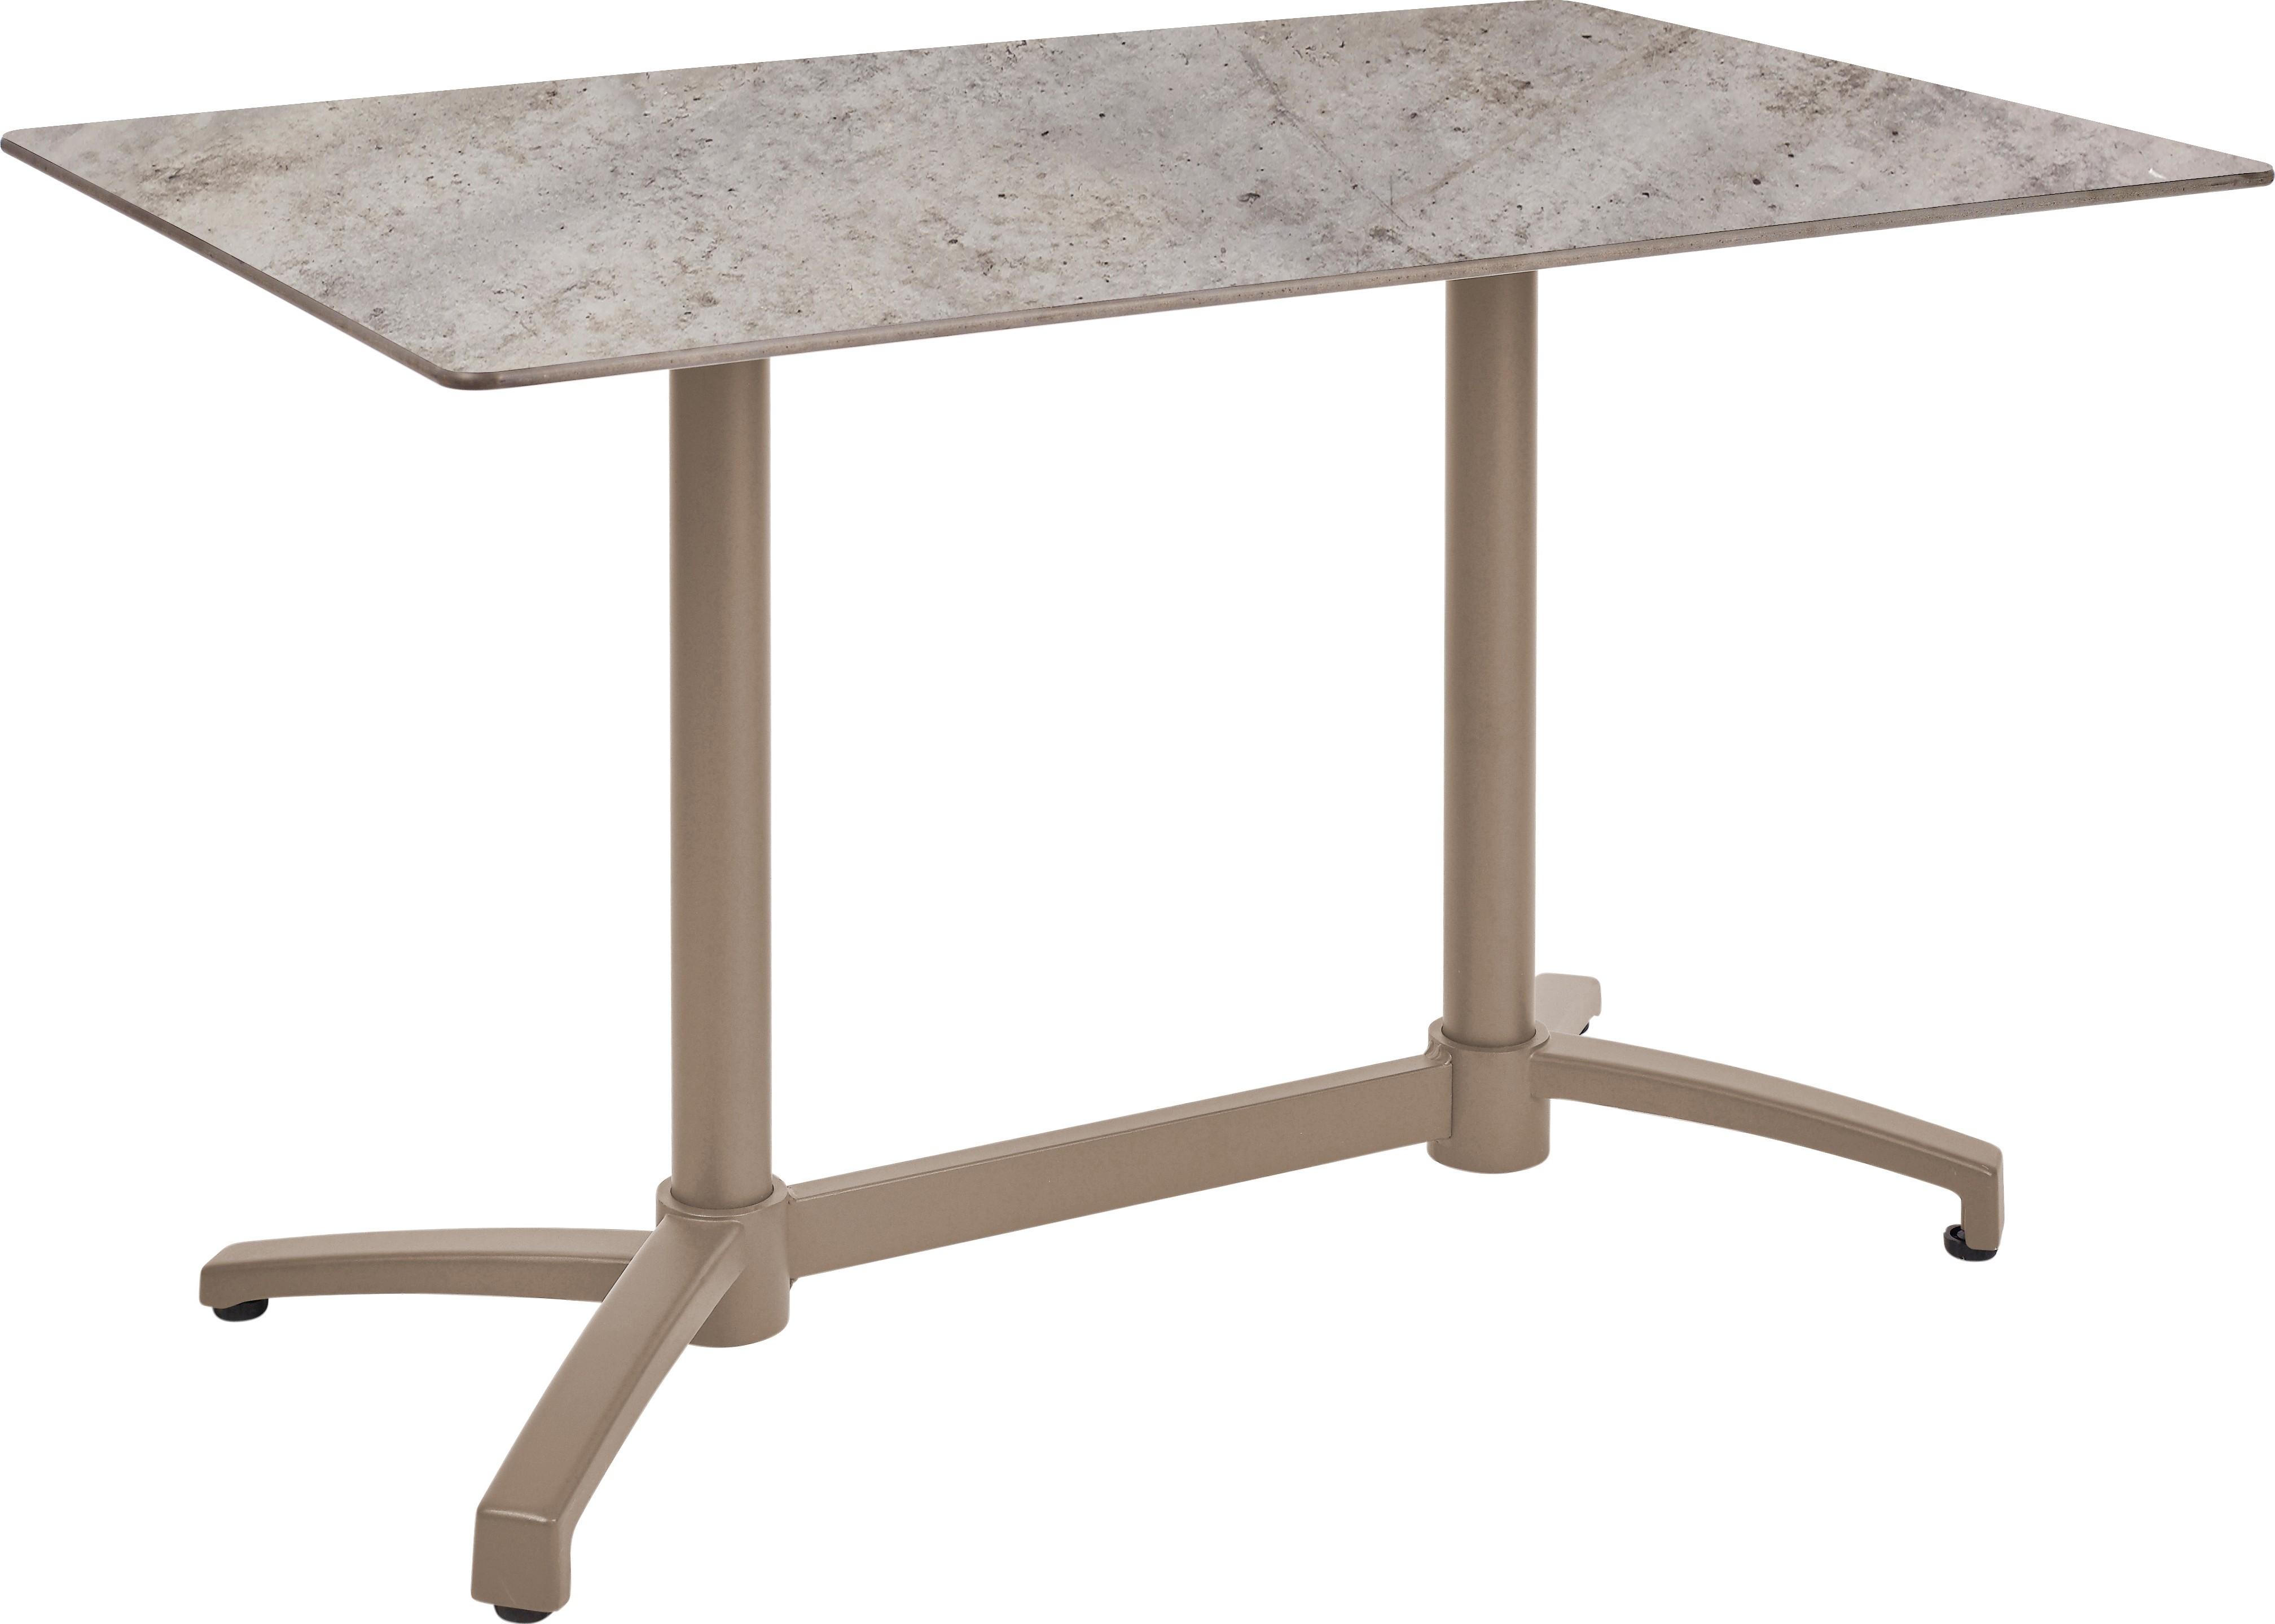 Mesa Ezpeleta abatible Taupe Marrones concrete Aluminio lacado 120x80